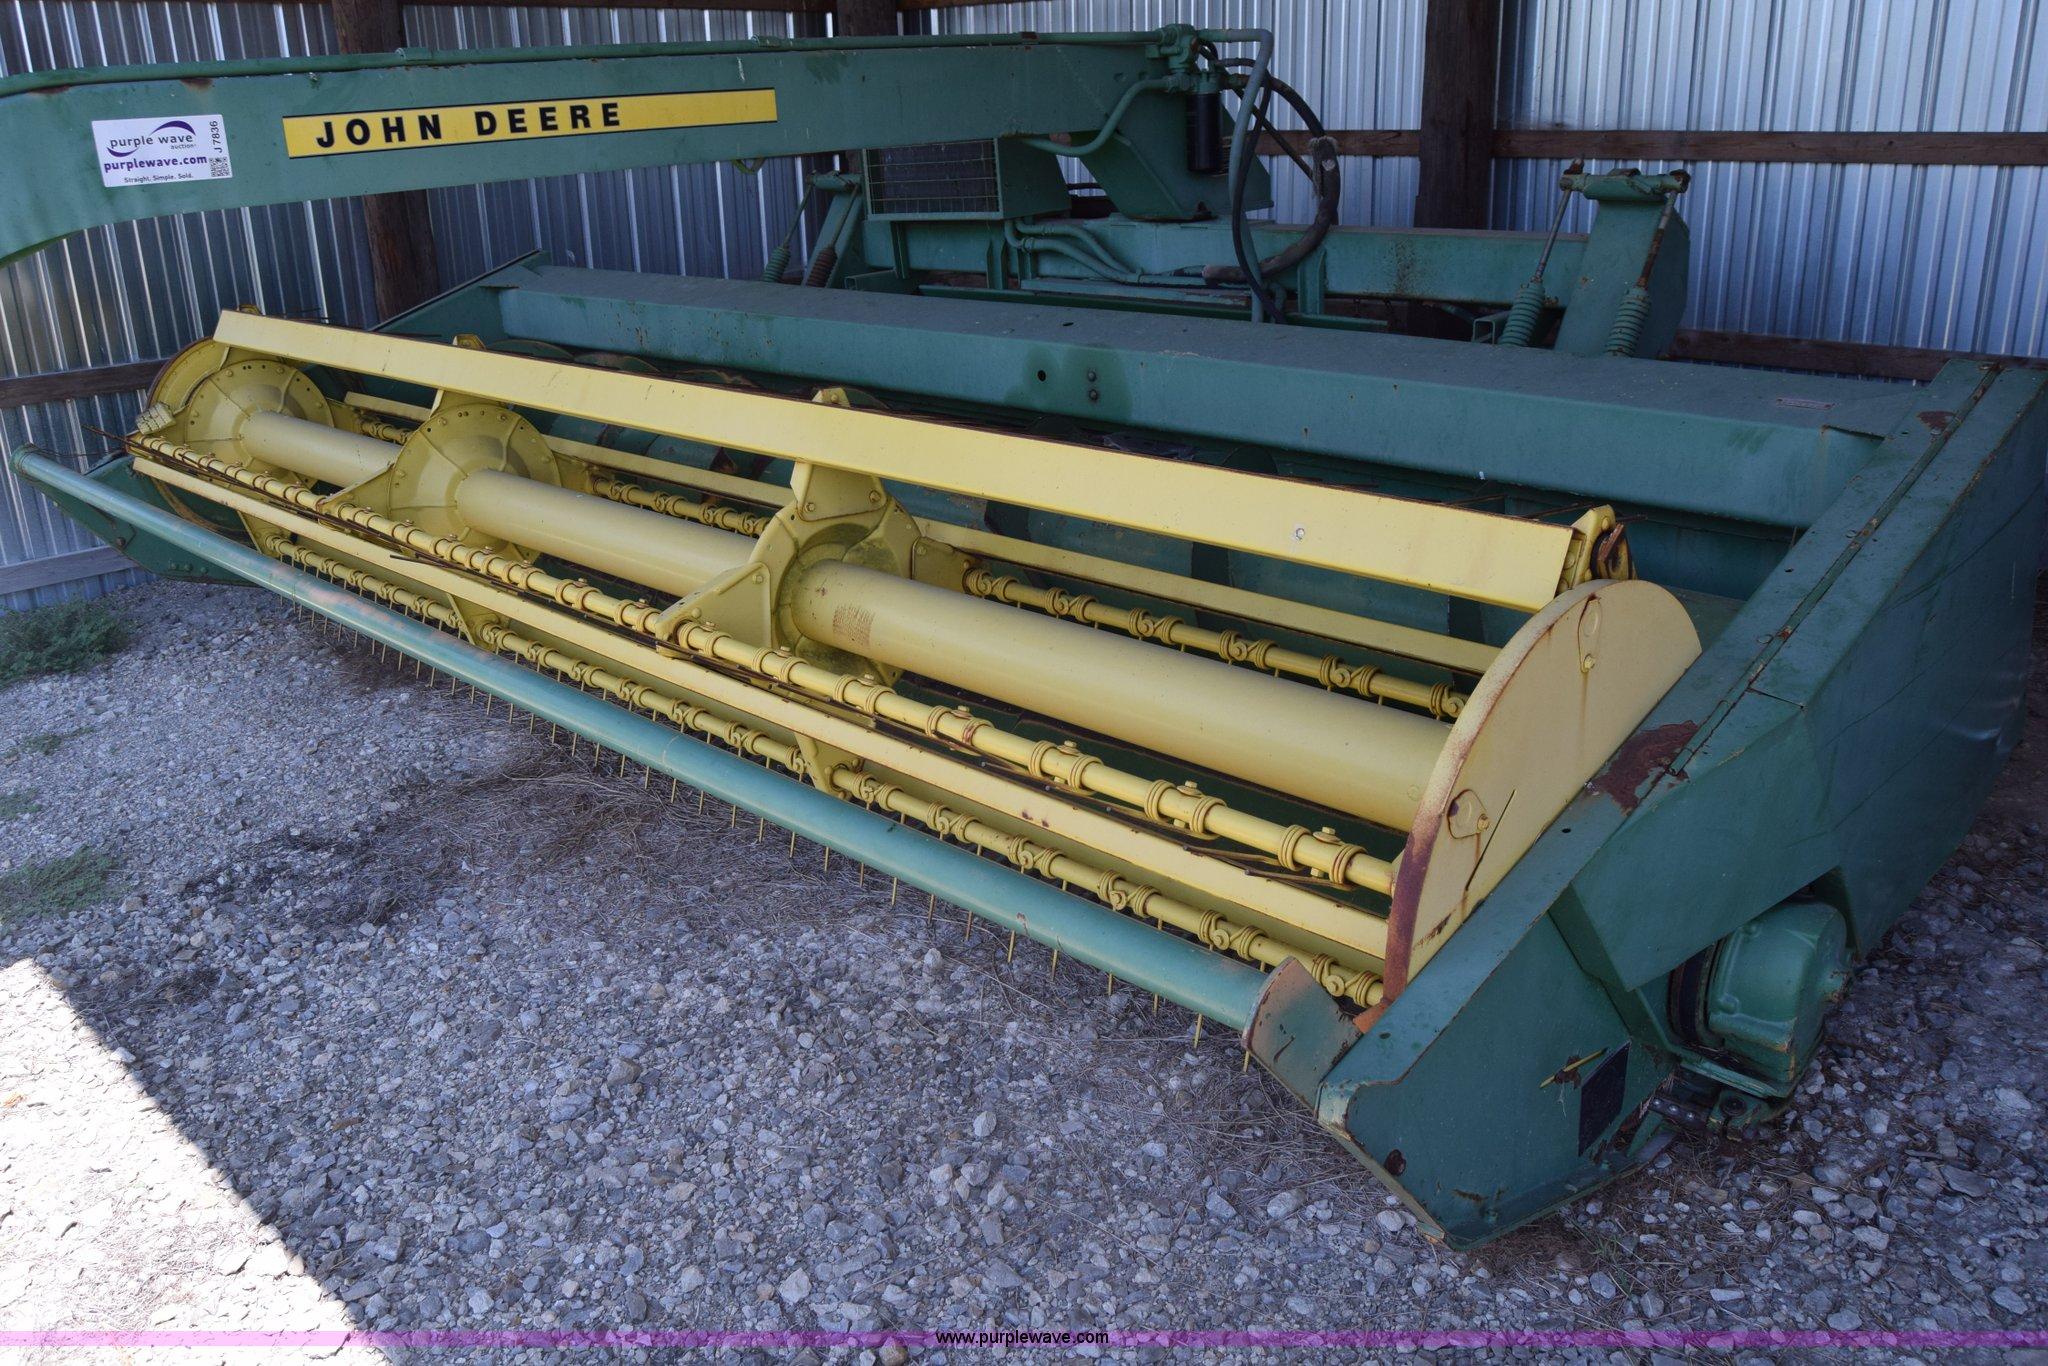 John Deere pull type windrower | Item J7836 | SOLD! August 2